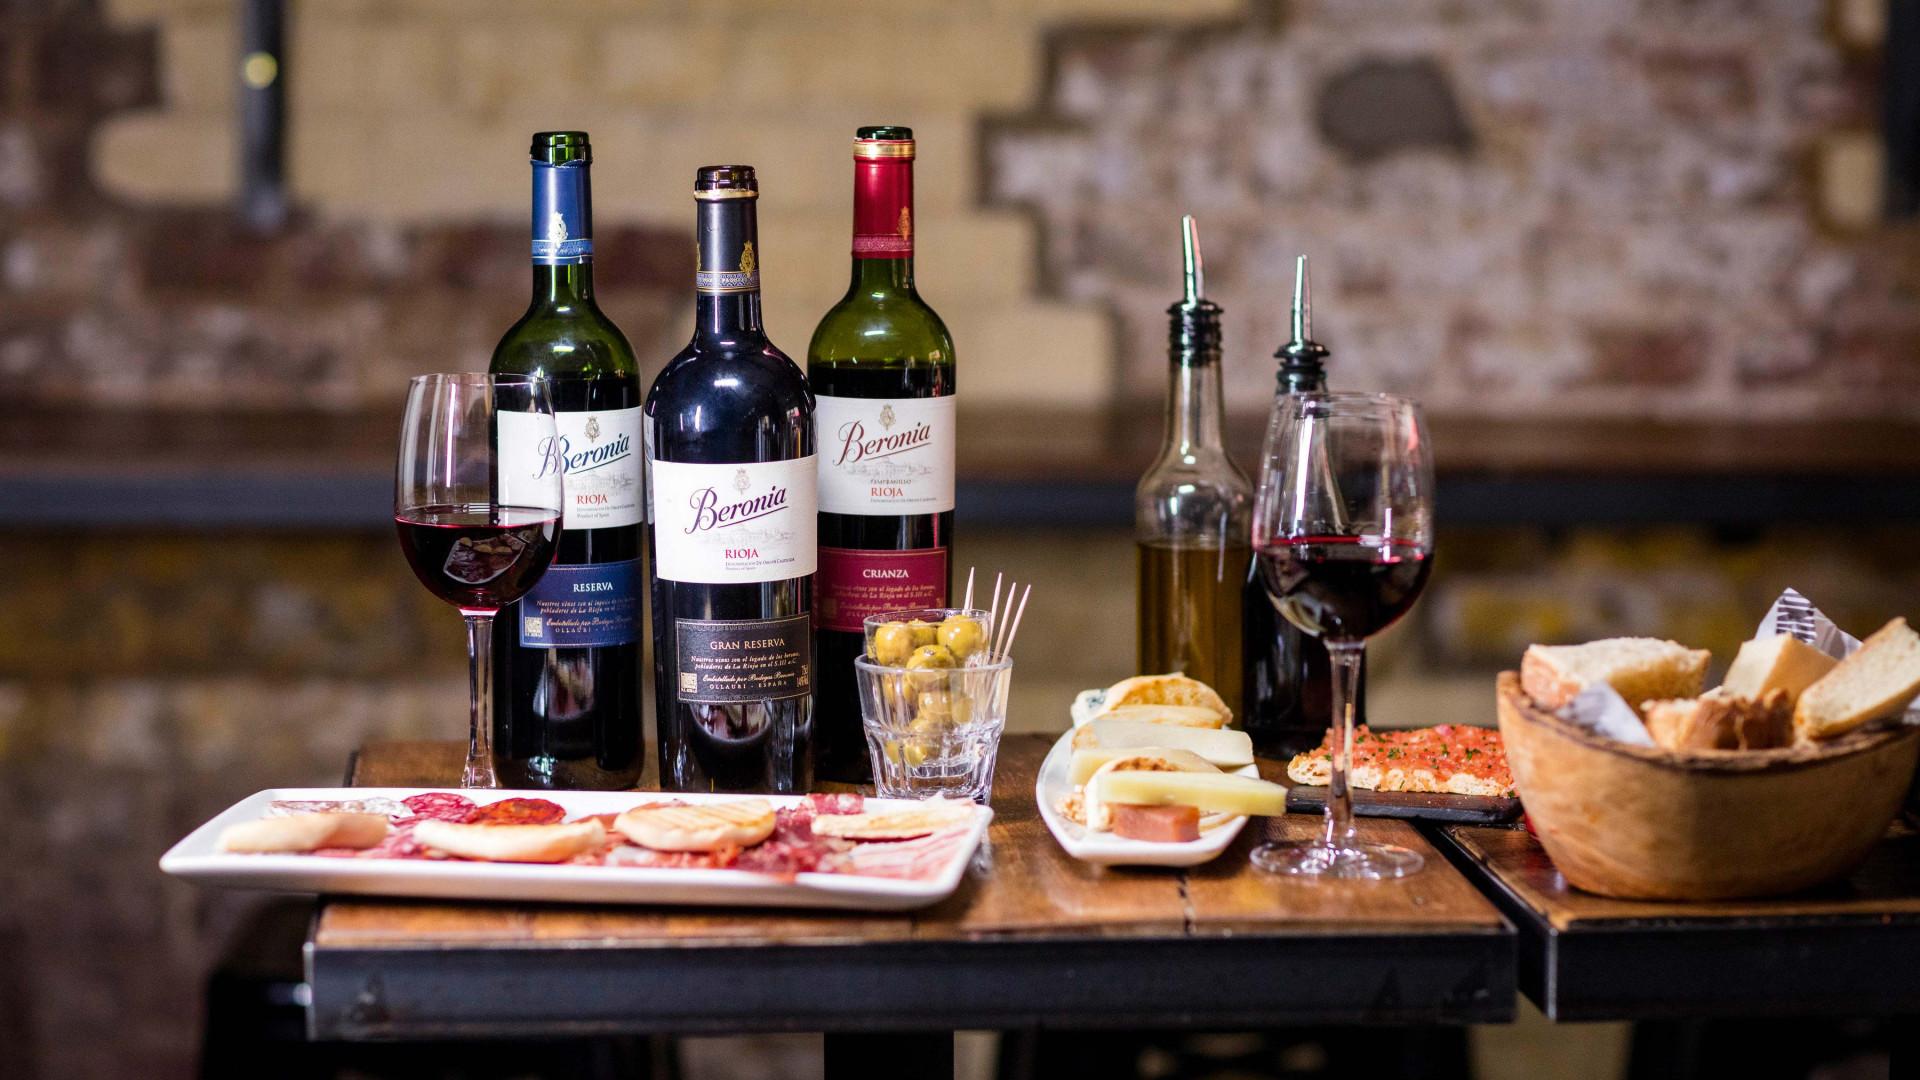 Beronia wine